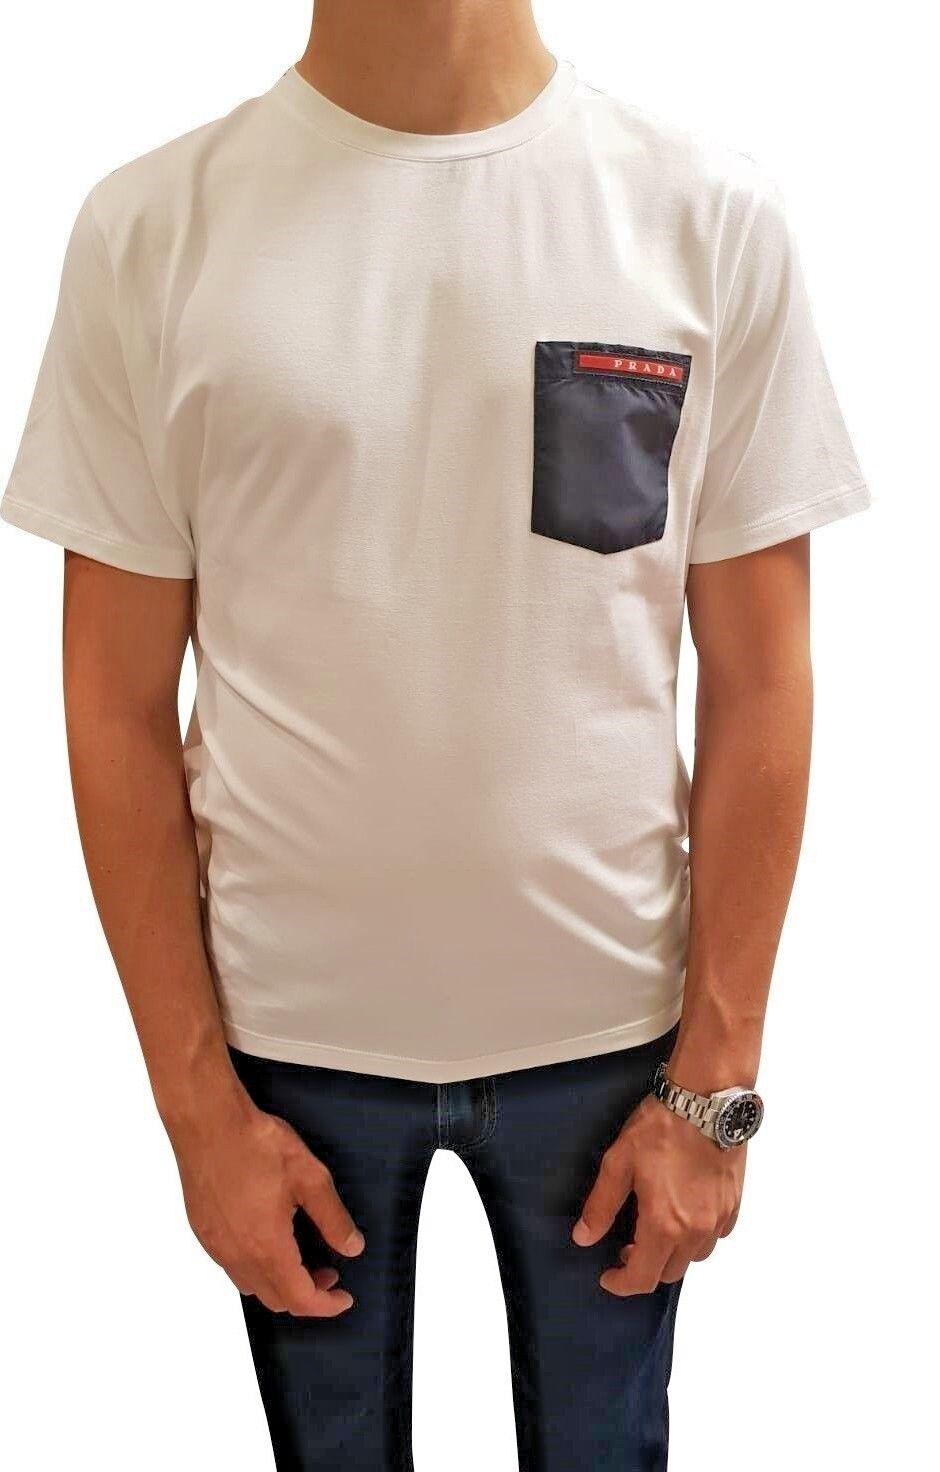 PRADA T-shirt  Short Sleeve Weiß Blau Girocollo M/C Cotoon Stretch